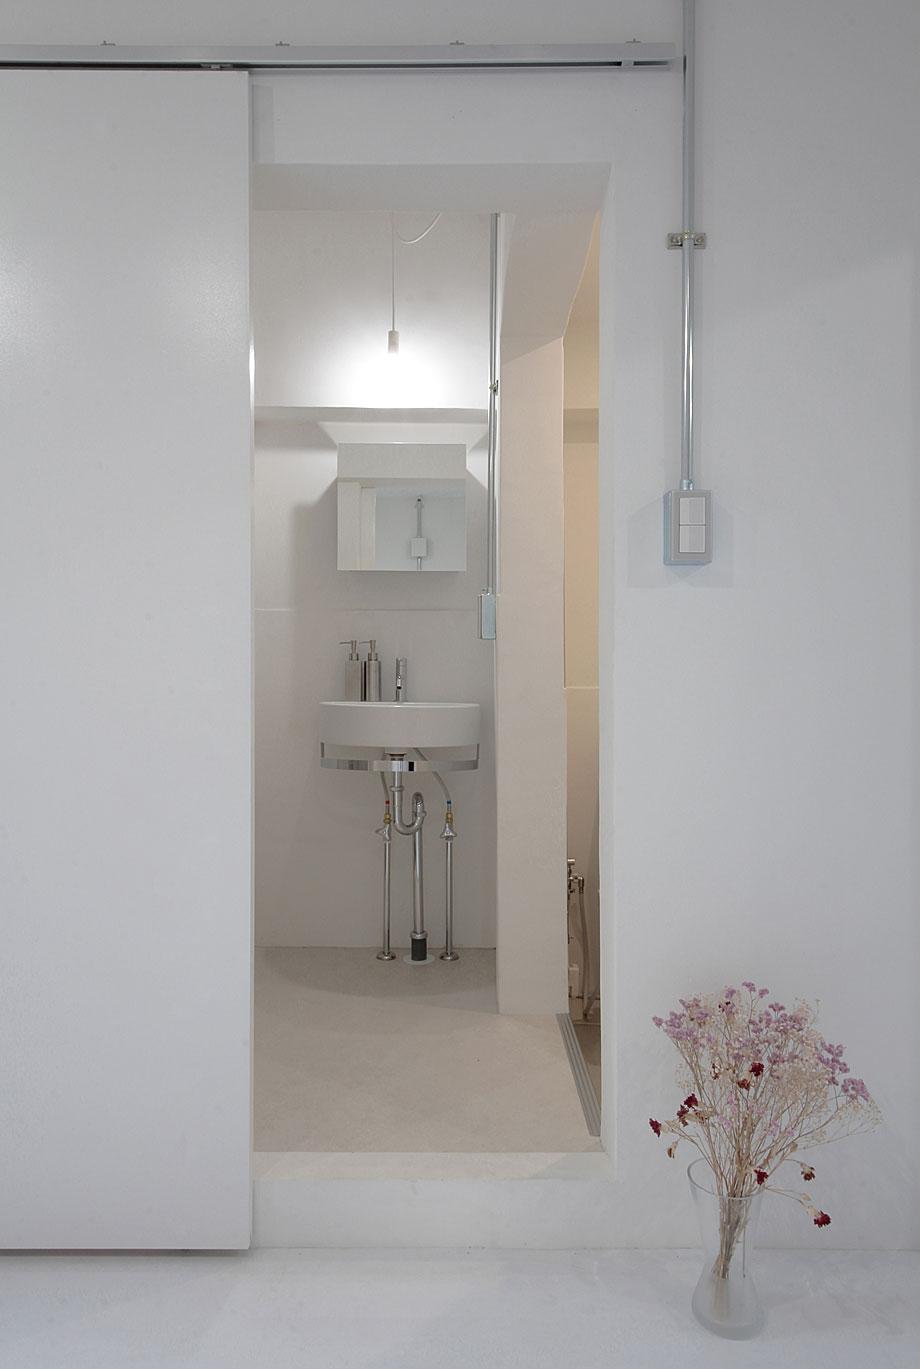 apartamento-osaka-japon-jun-murata-20